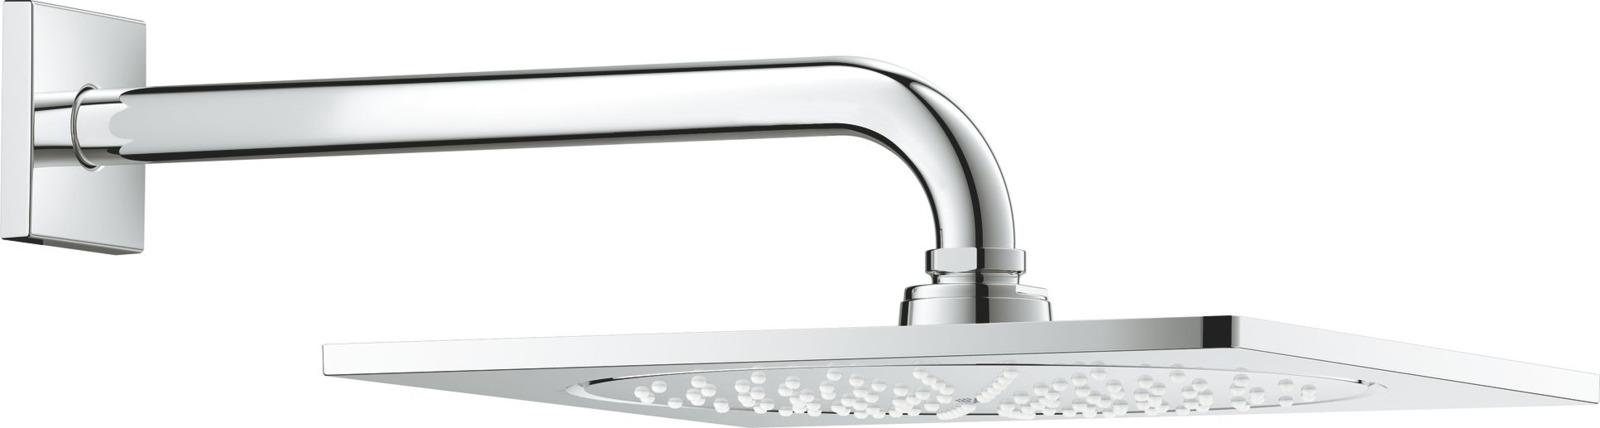 Душевой комплект Grohe Rainshower F-series 10 Верхний душ + Душевой кронштейн, 26070000, серебристый верхний душ grohe rainshower f series 26061000